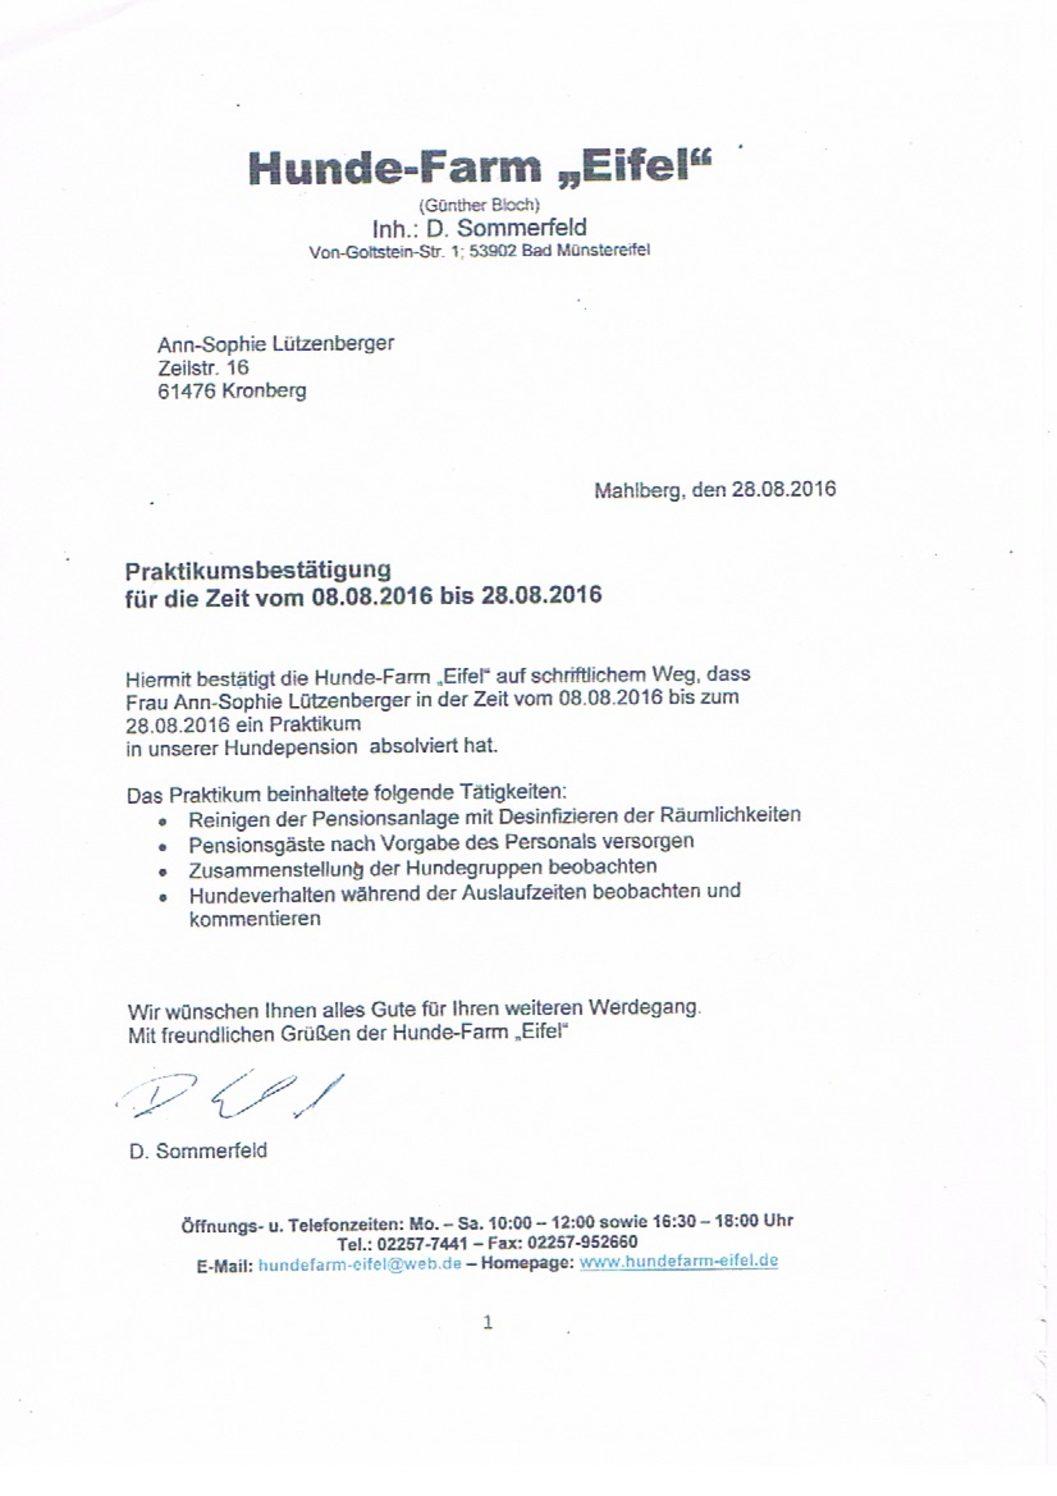 Praktikum Hundefarm Eifel August 2016 Ann-Sophie Lützenberger 2